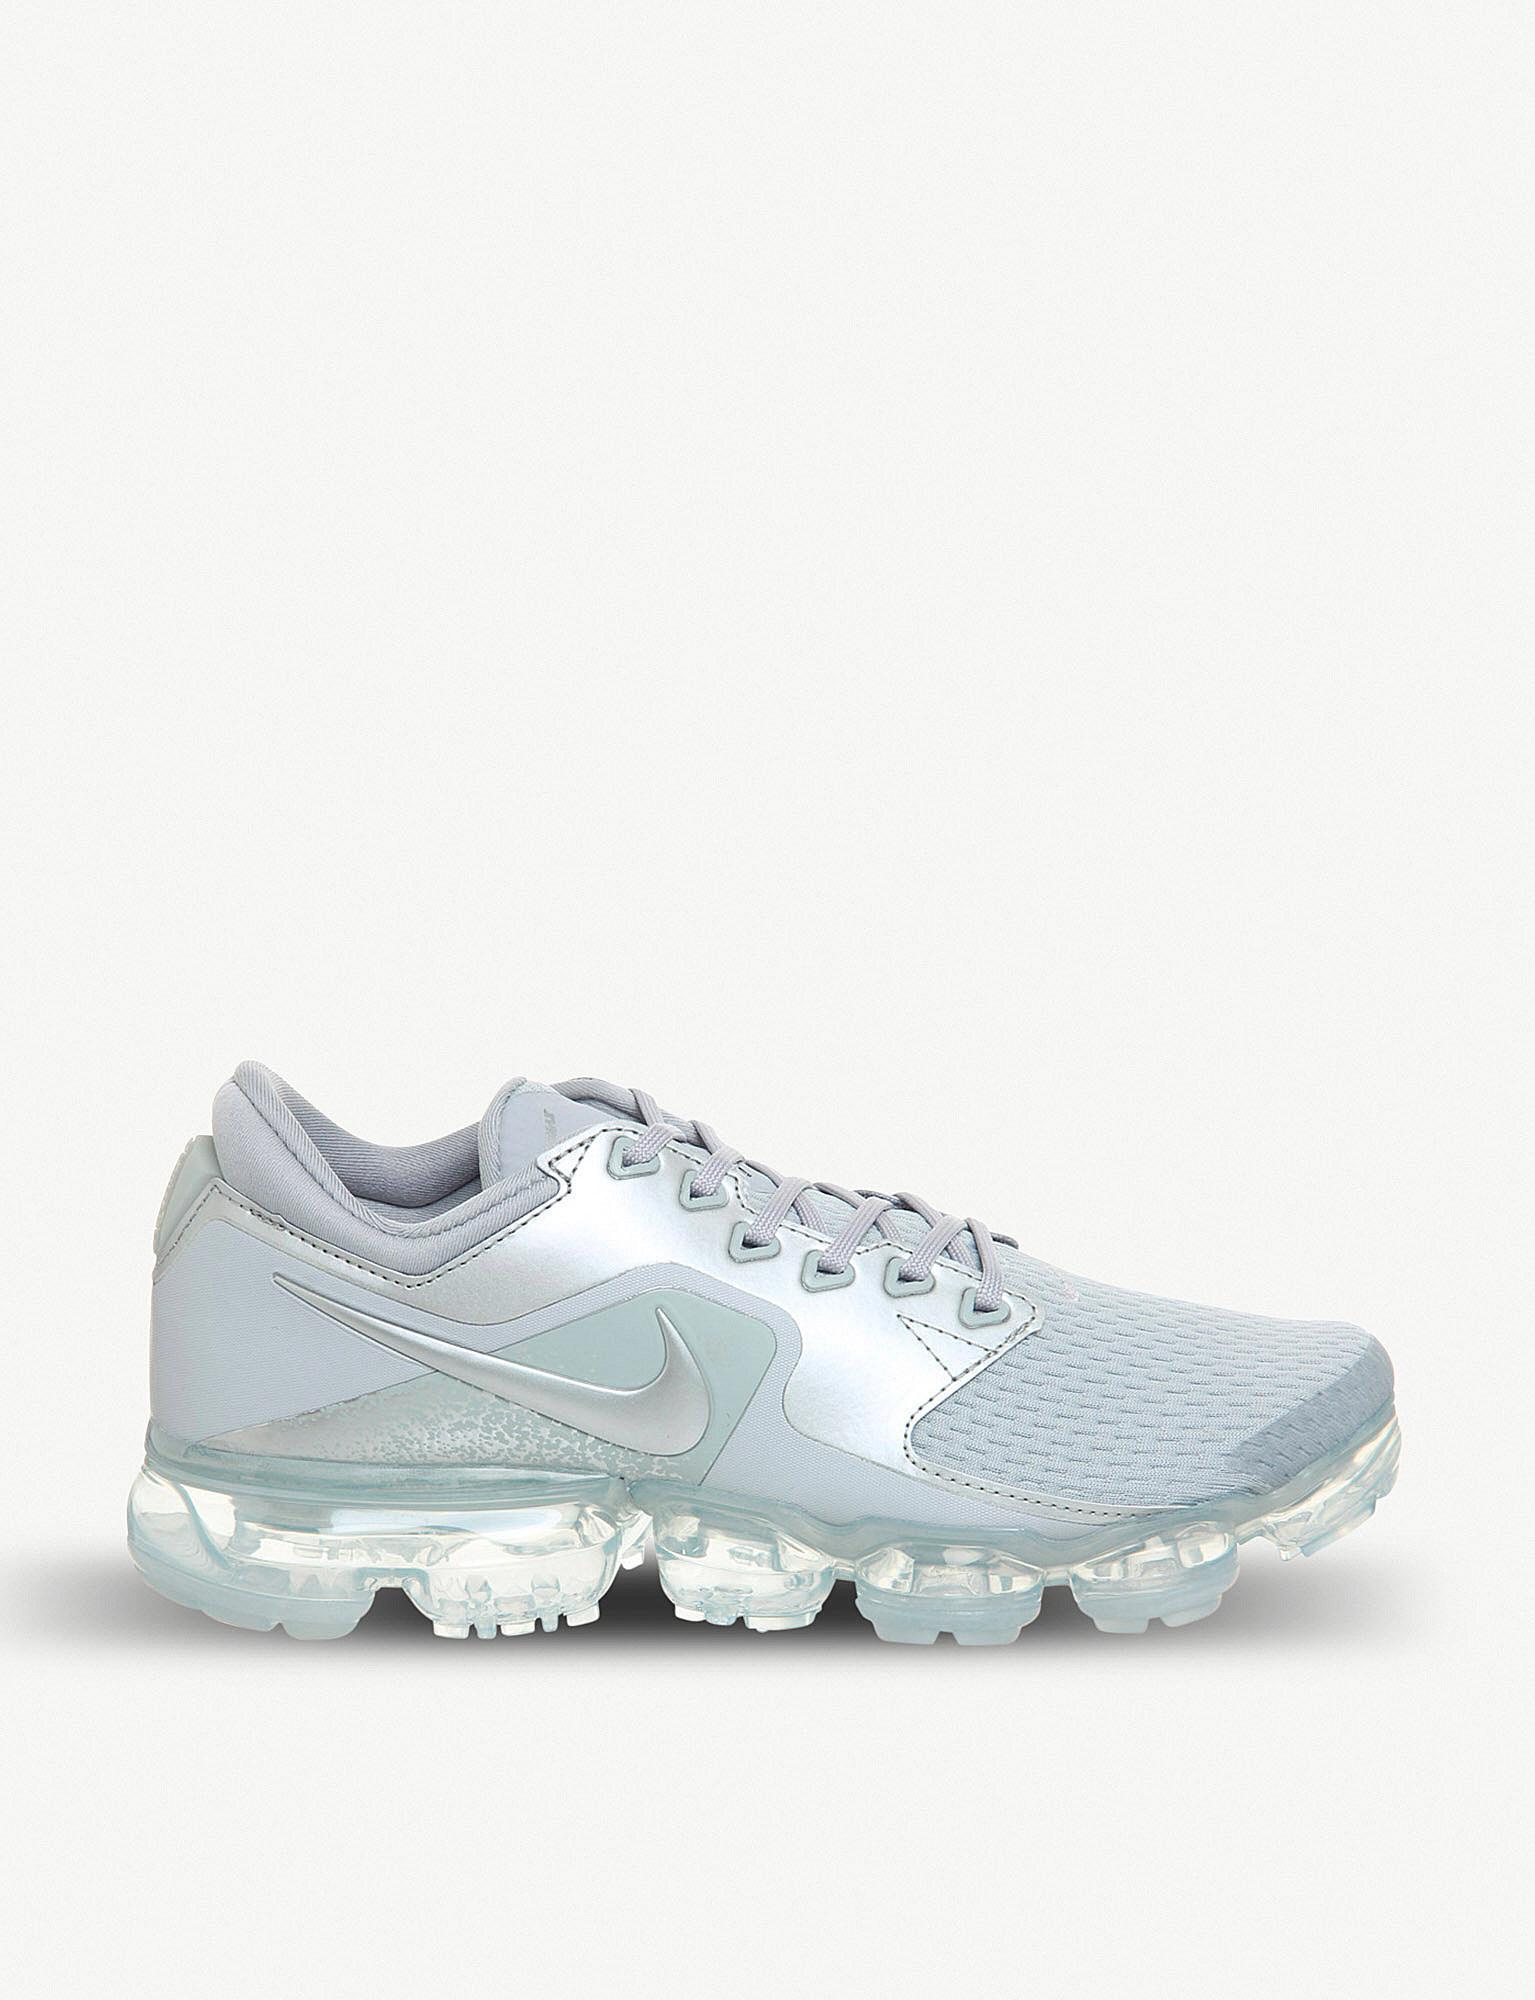 9e21a95881b Nike Air Vapormax Mesh And Metallic Trainers - Lyst